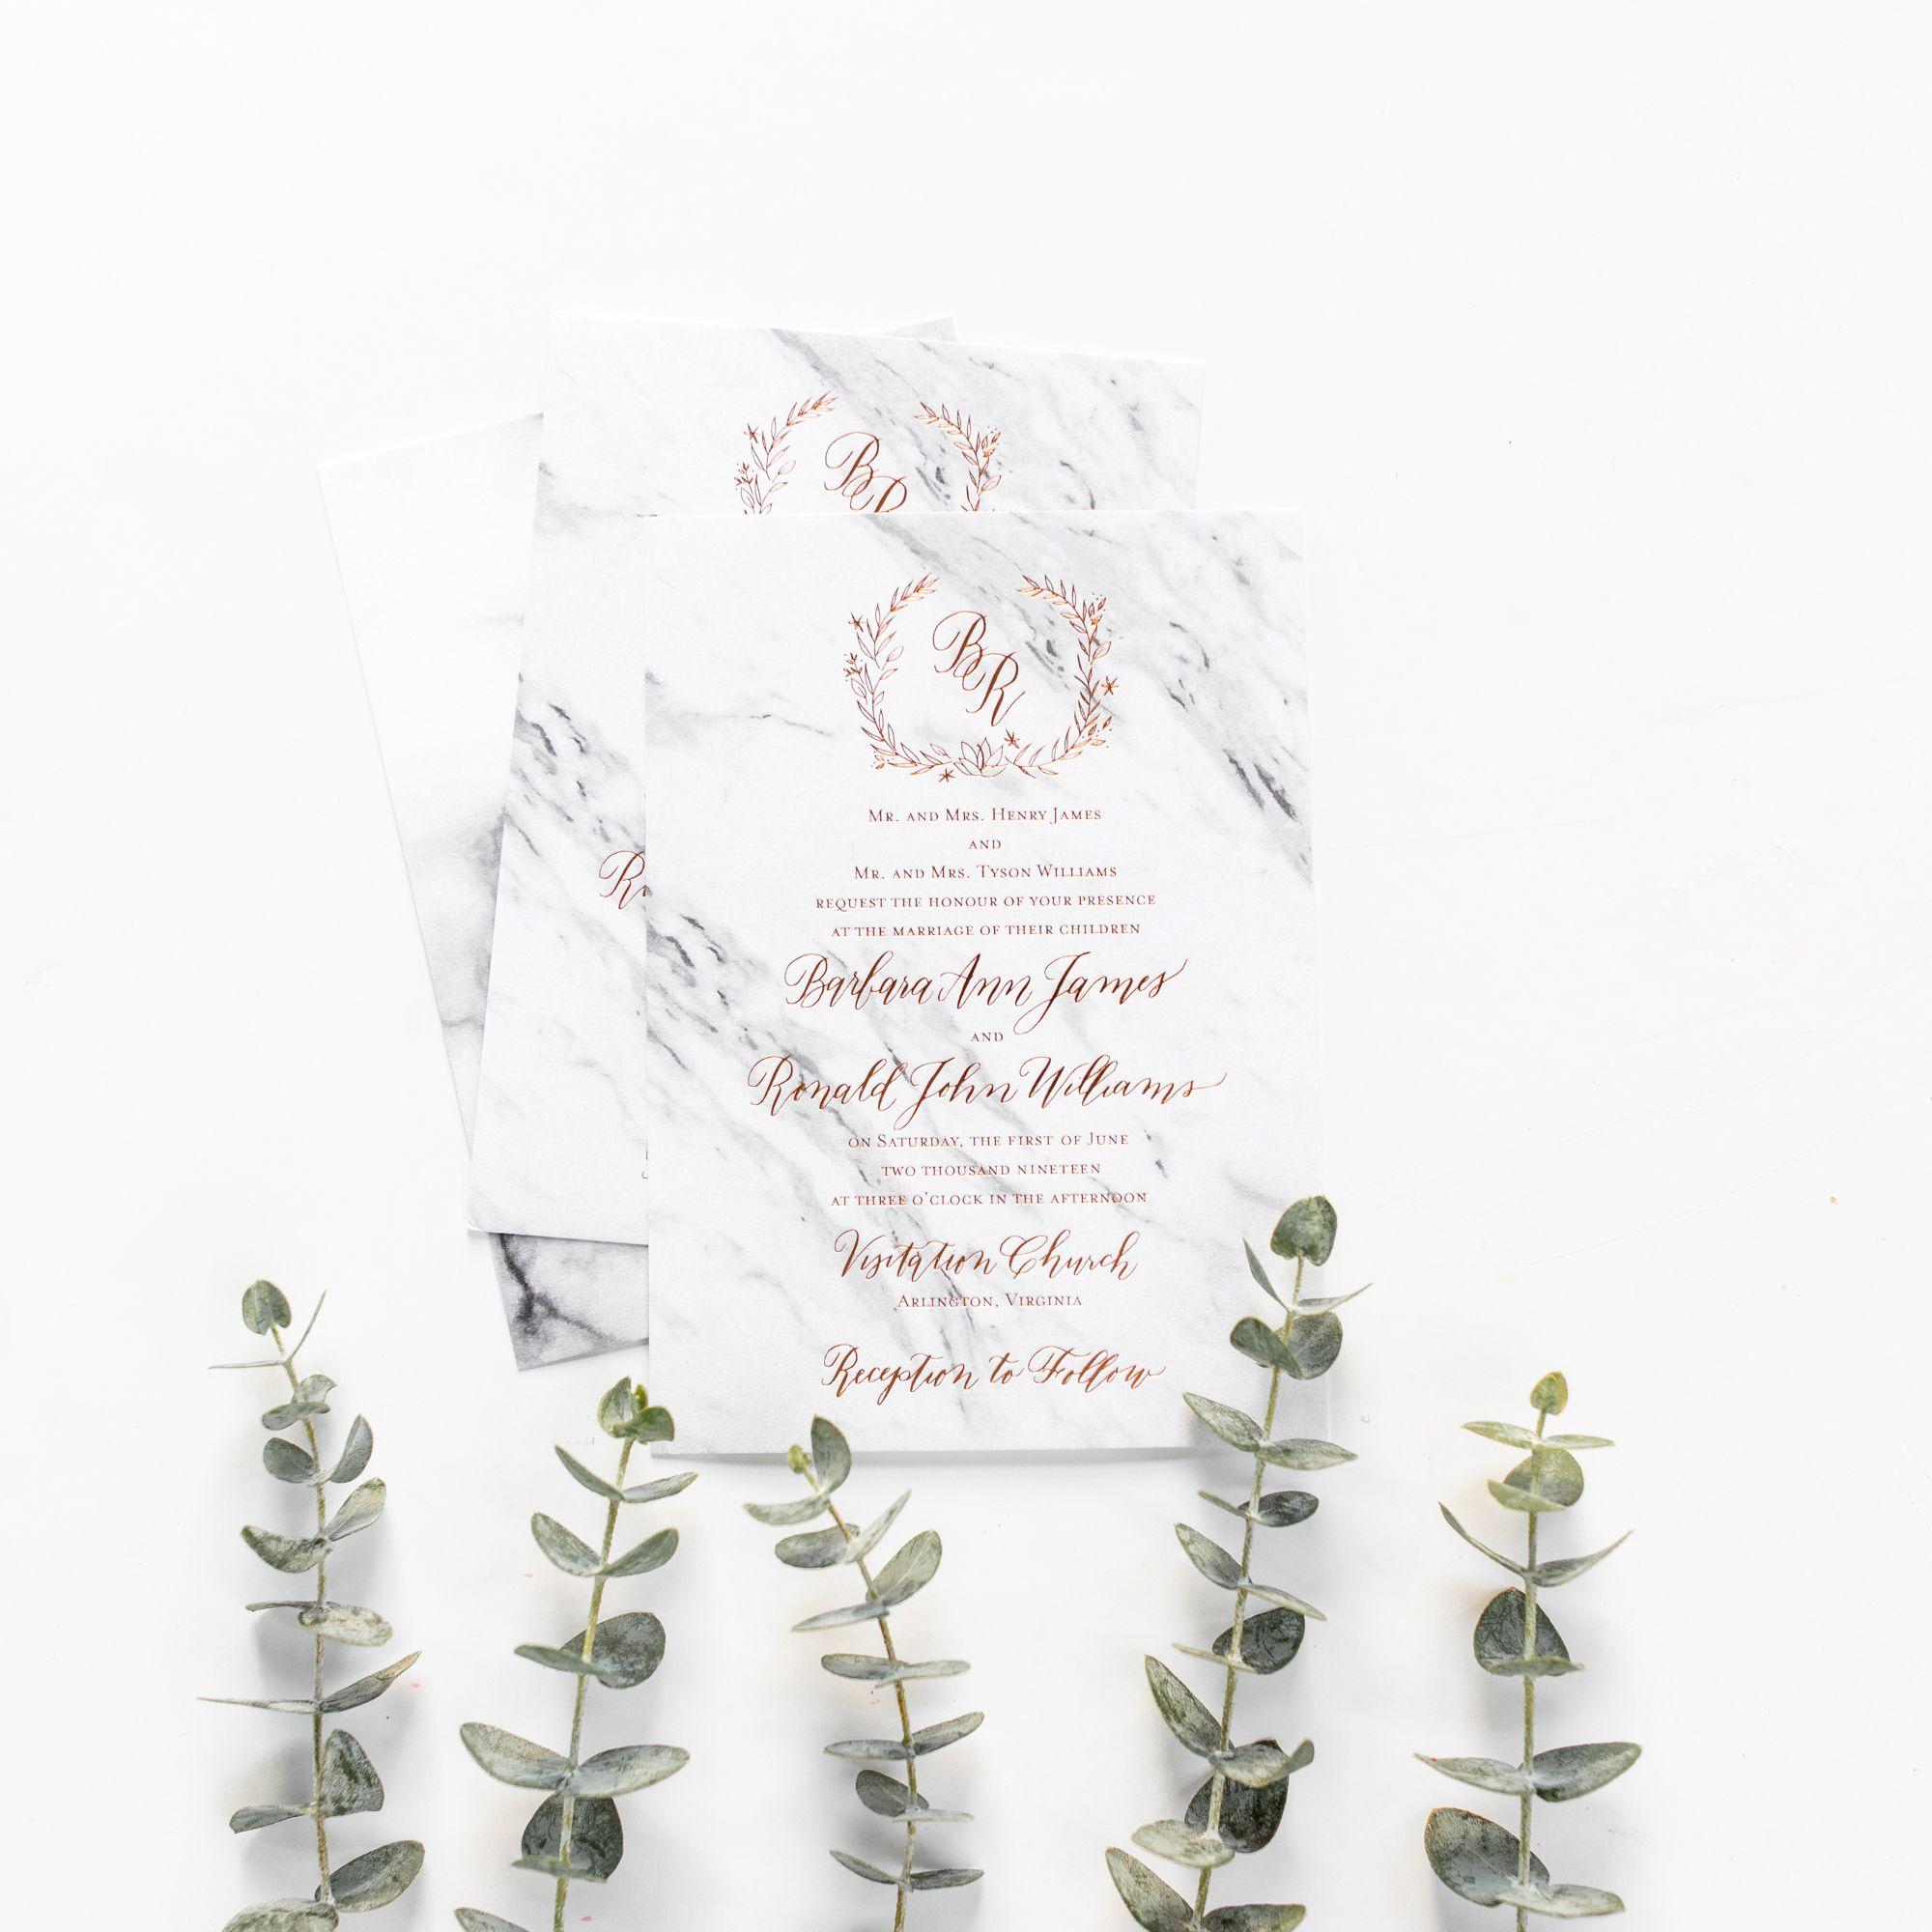 Invitations Wedding Calligraphy Calligraphy And Laura Hooper